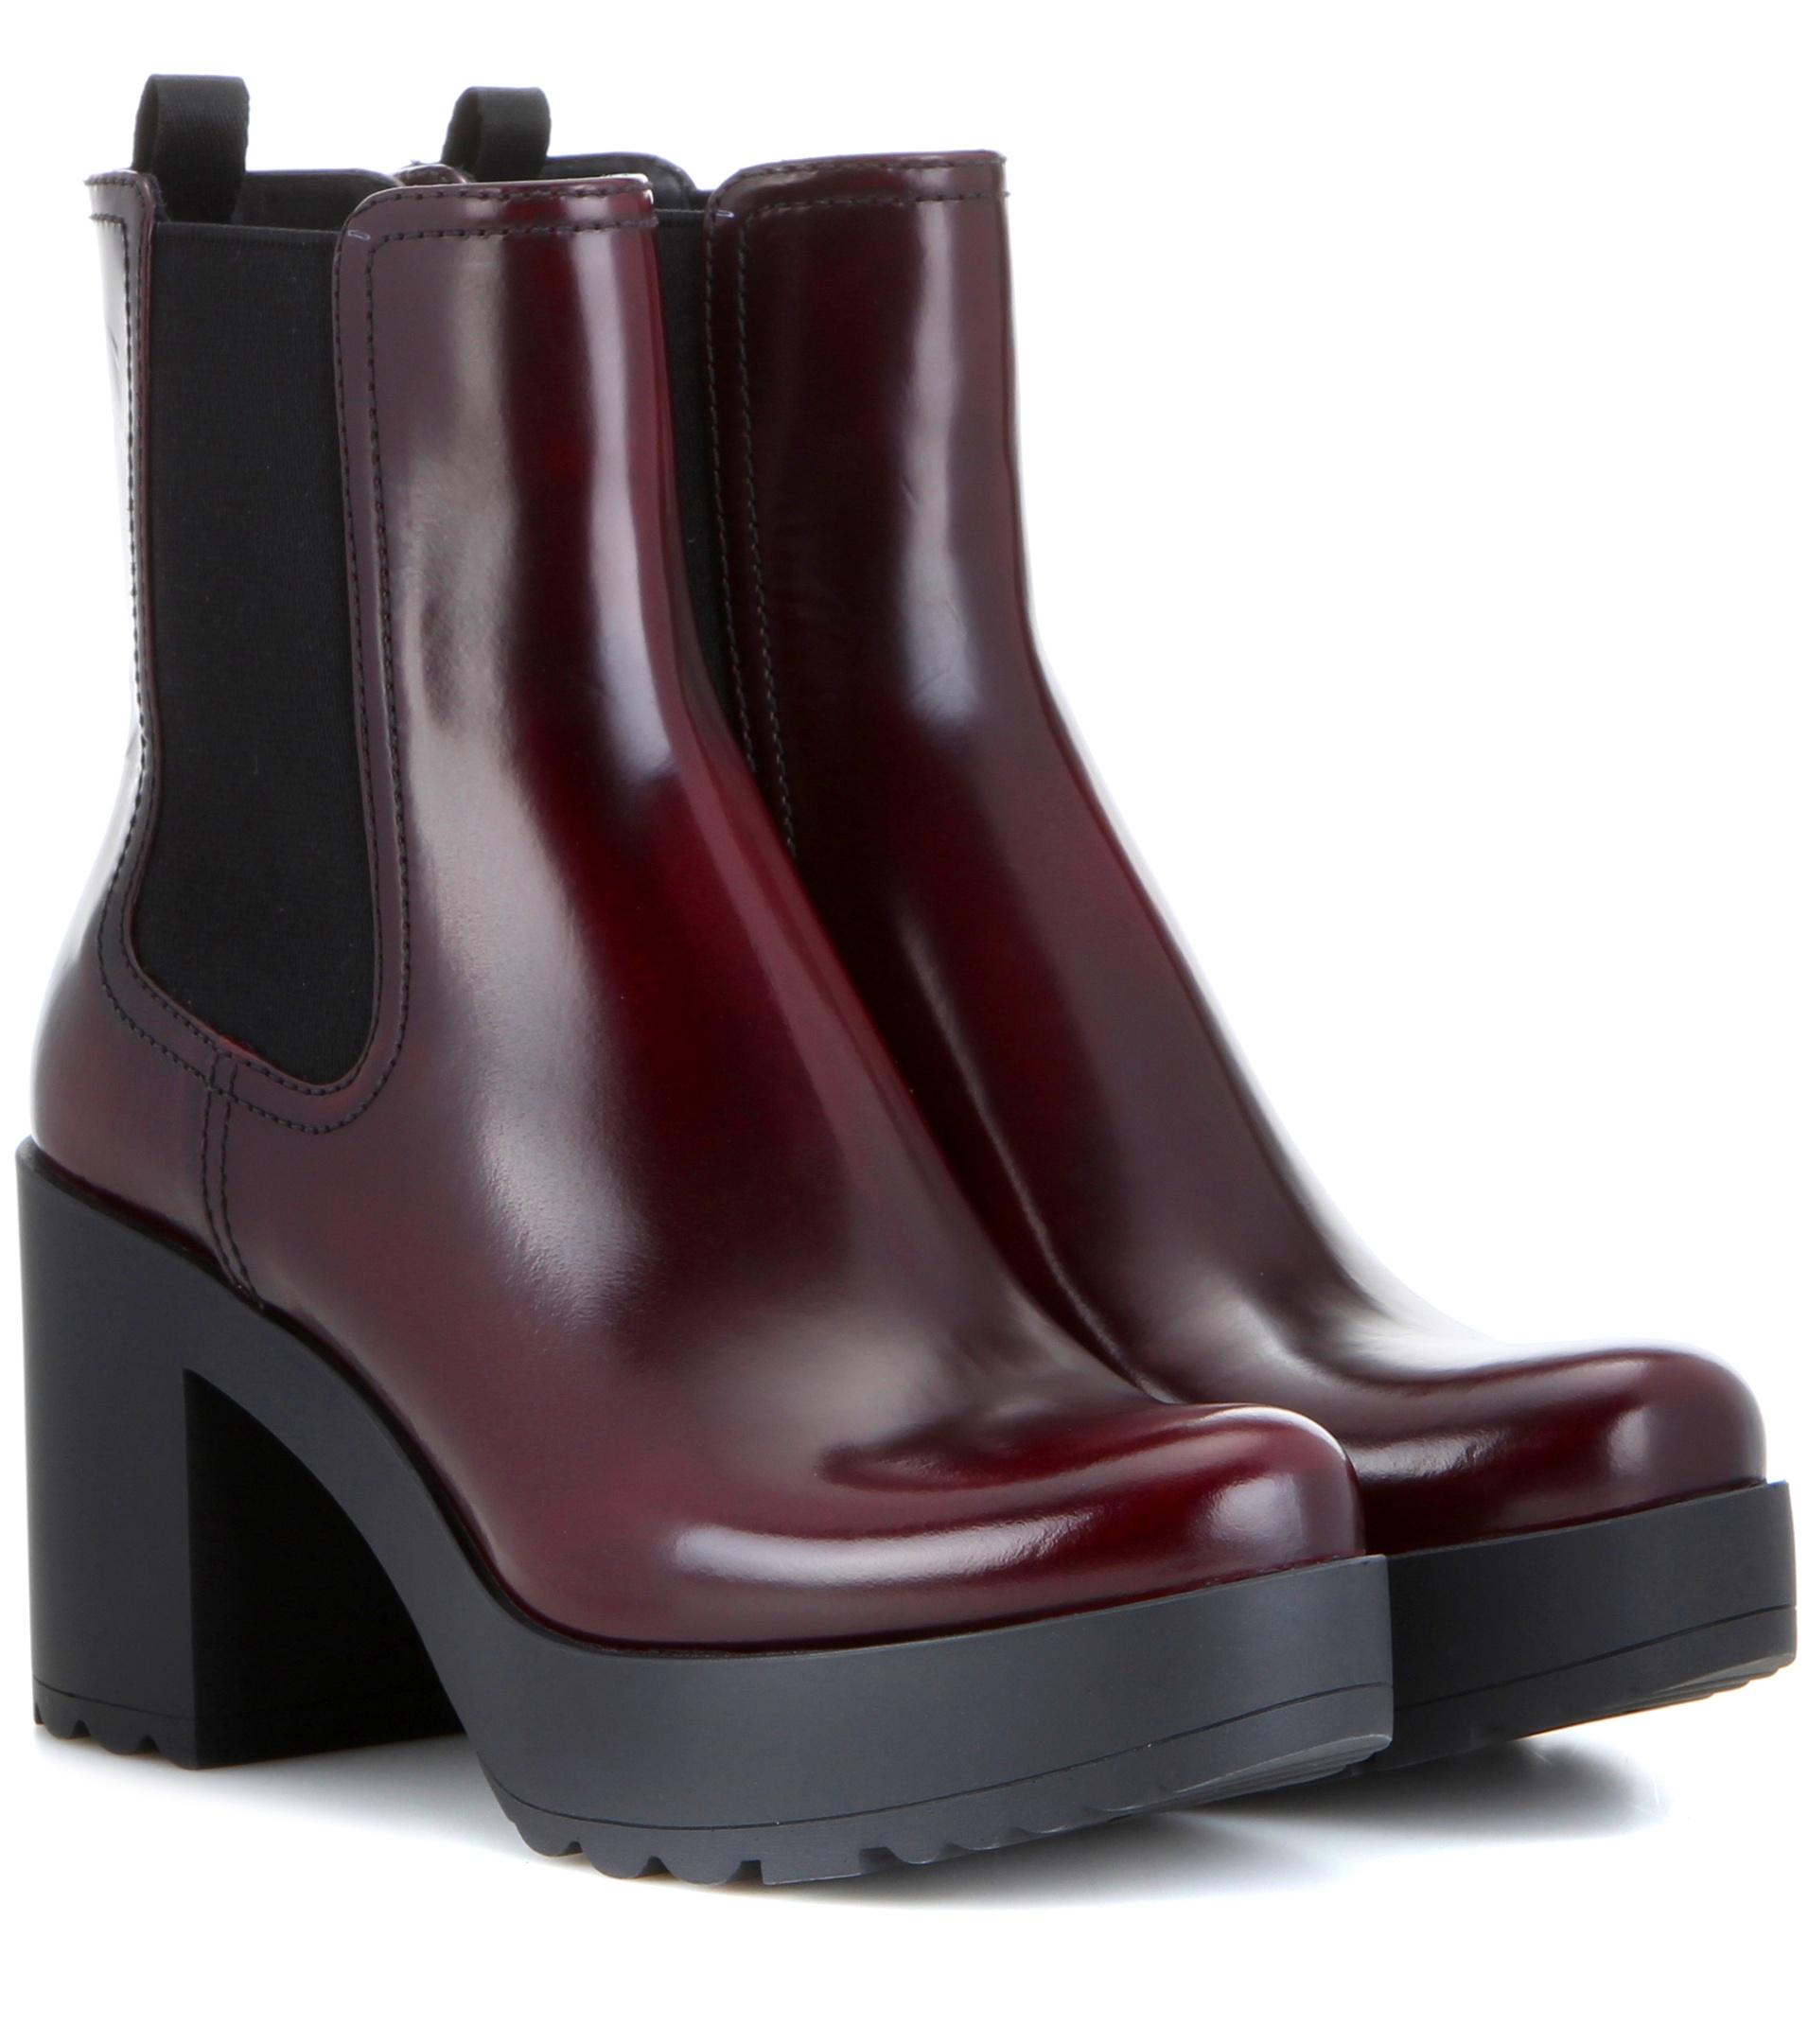 prada platform patent chelsea boots in red lyst. Black Bedroom Furniture Sets. Home Design Ideas